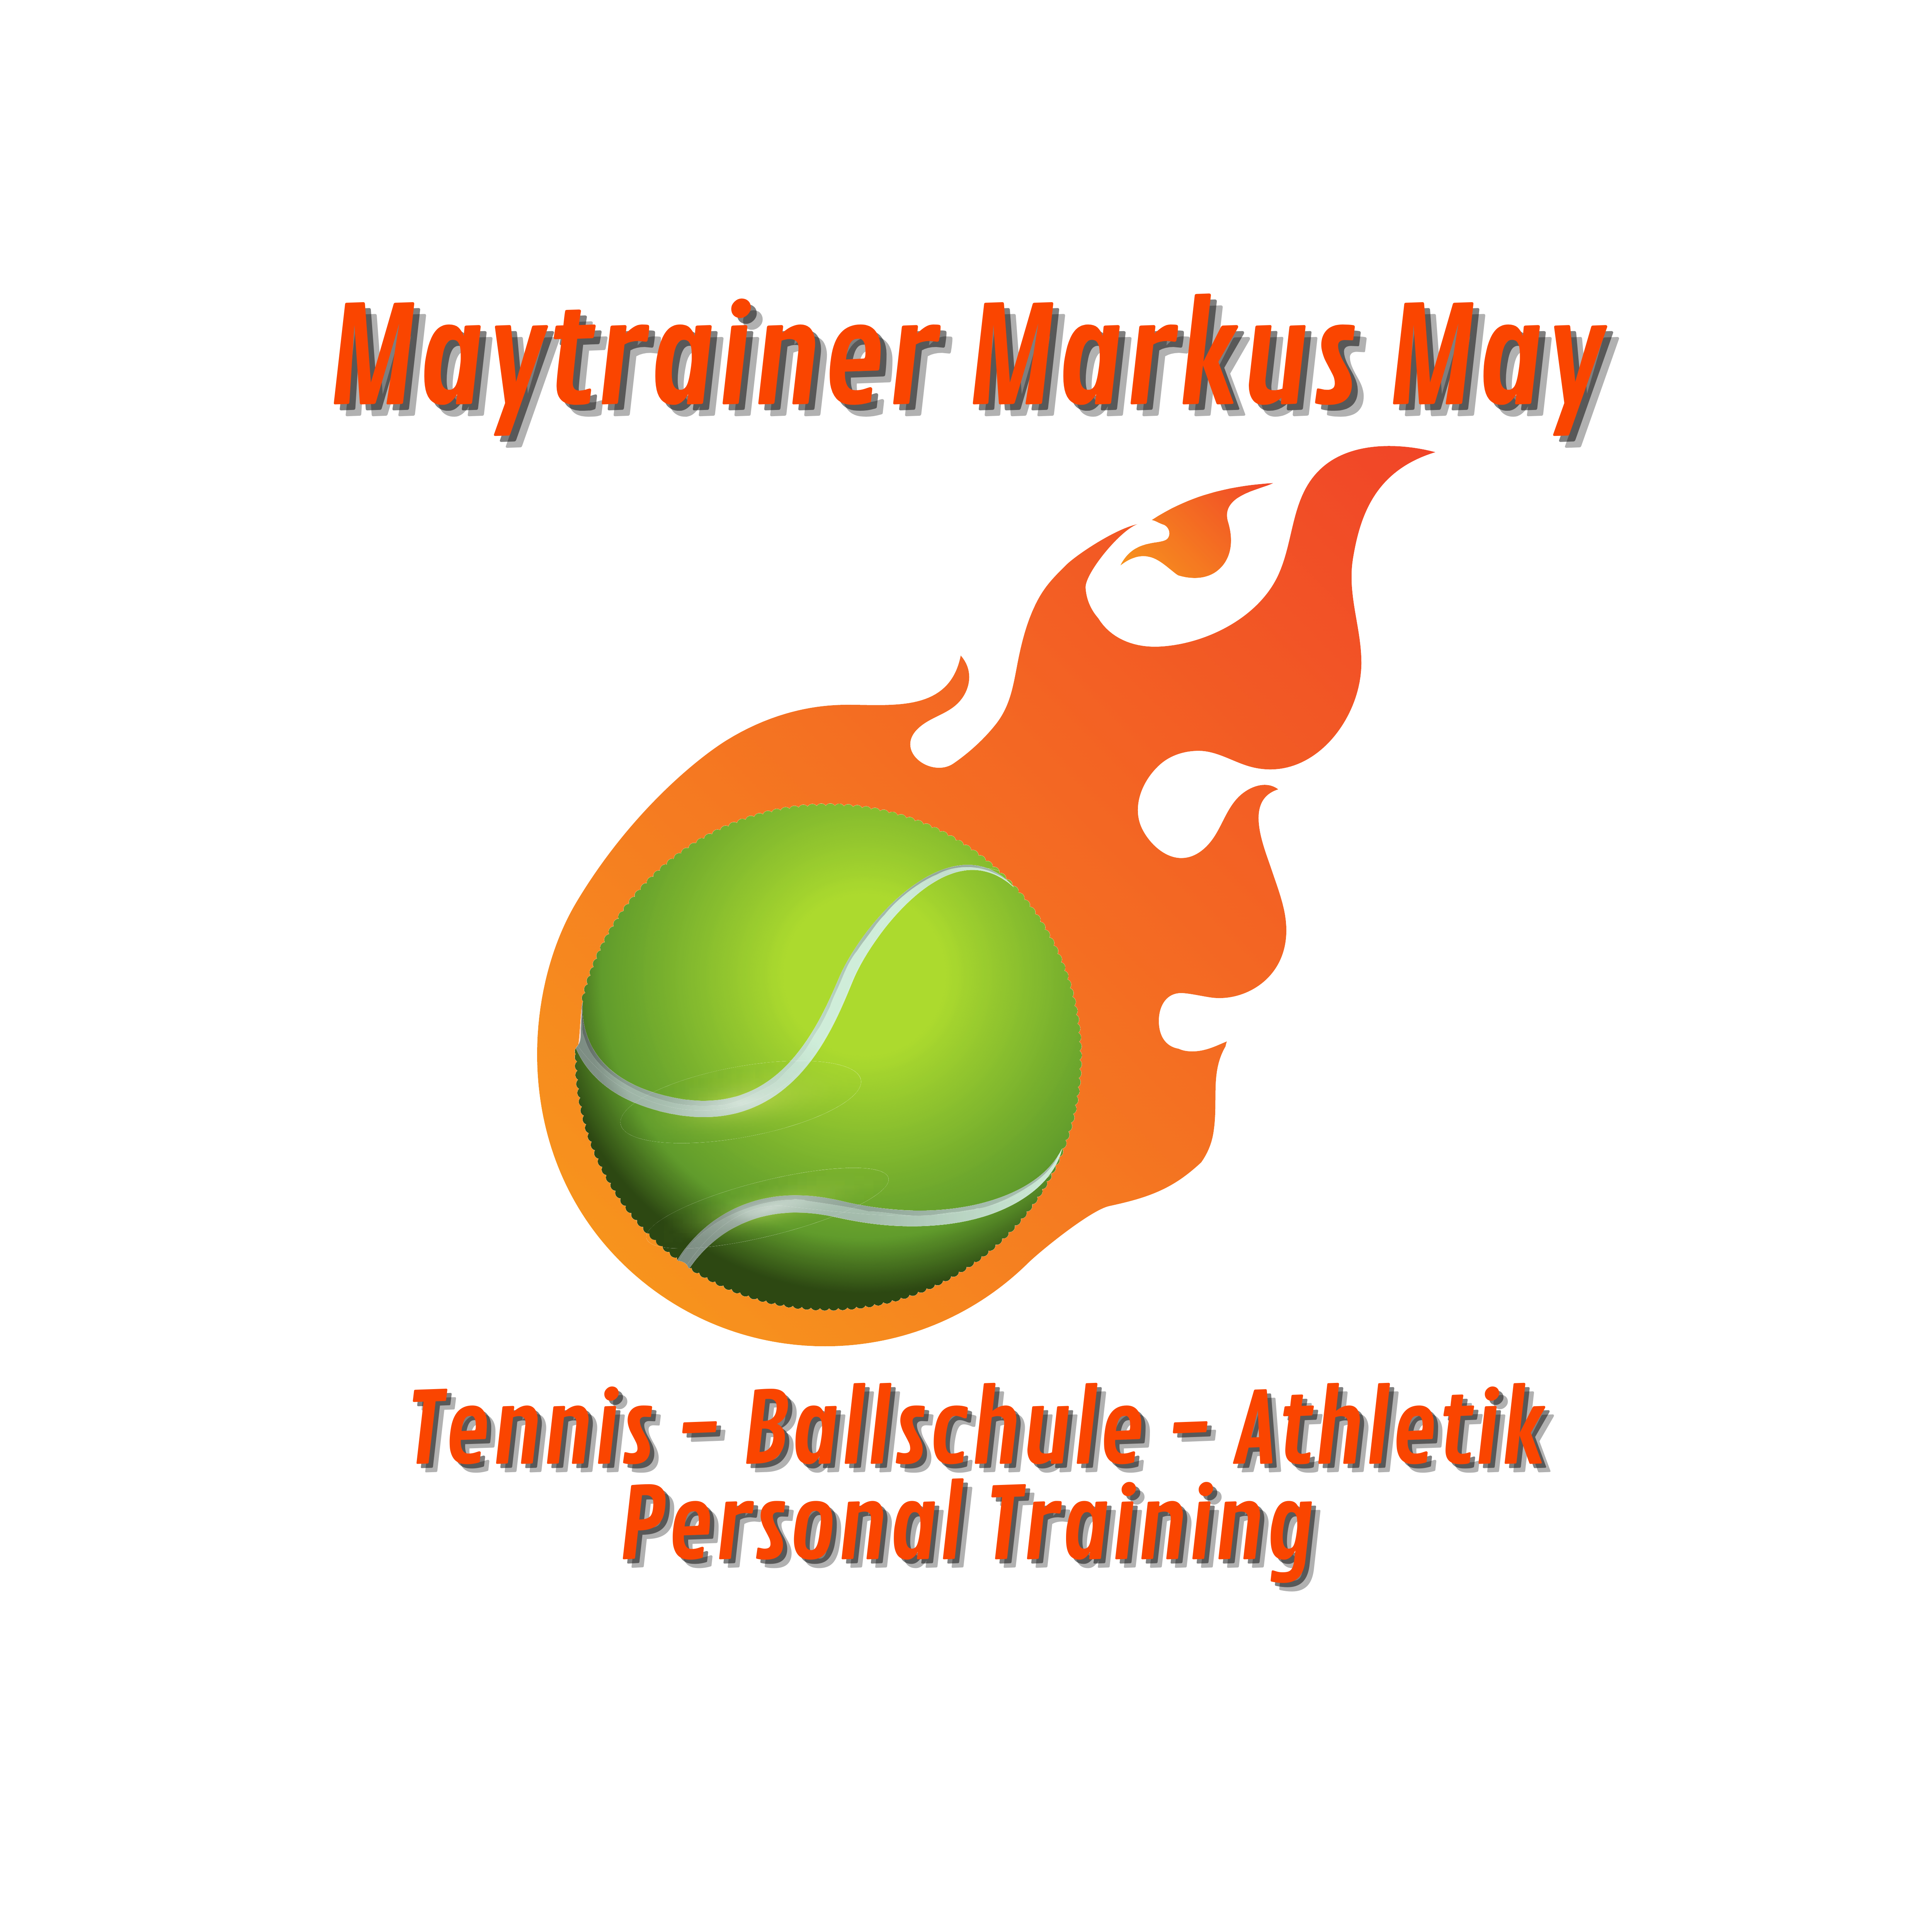 Logo Markus May final 132 cm